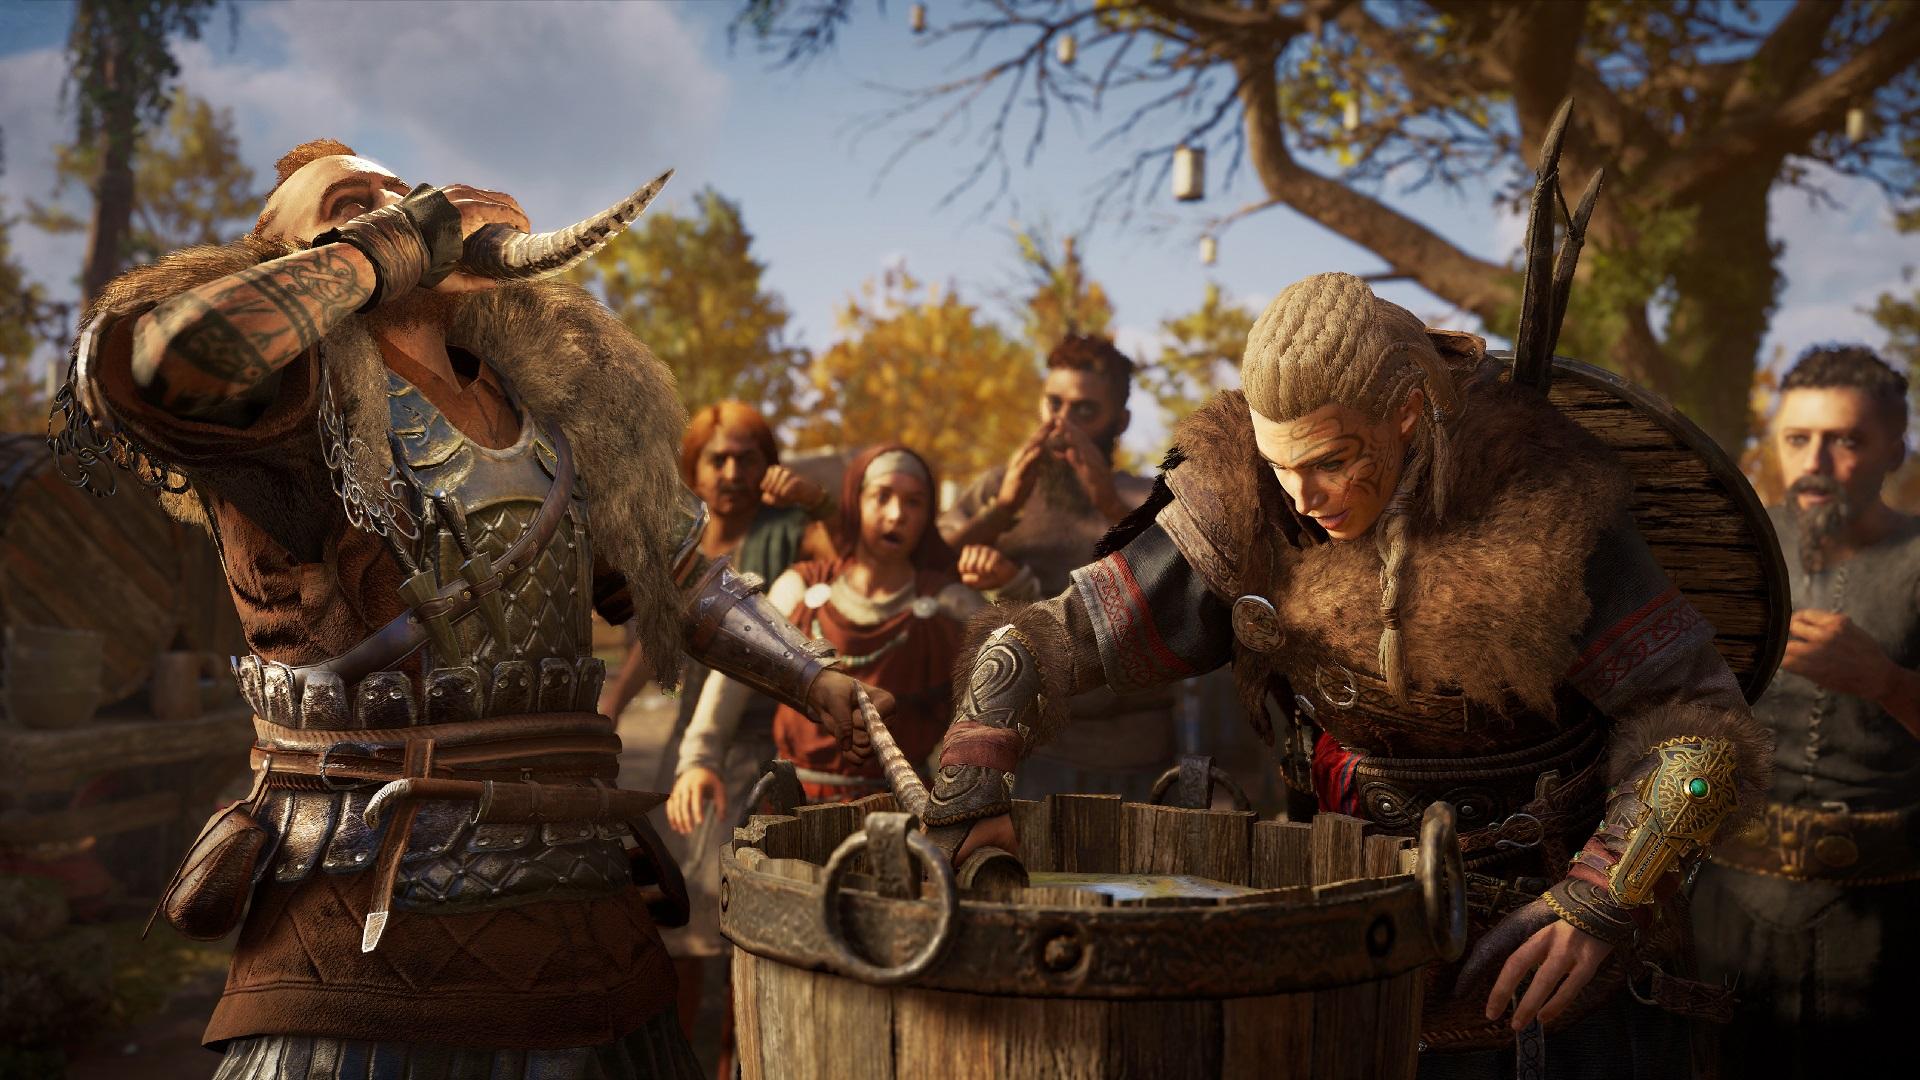 Ubisoft Details Assassin's Creed Valhalla Post-Launch Plans